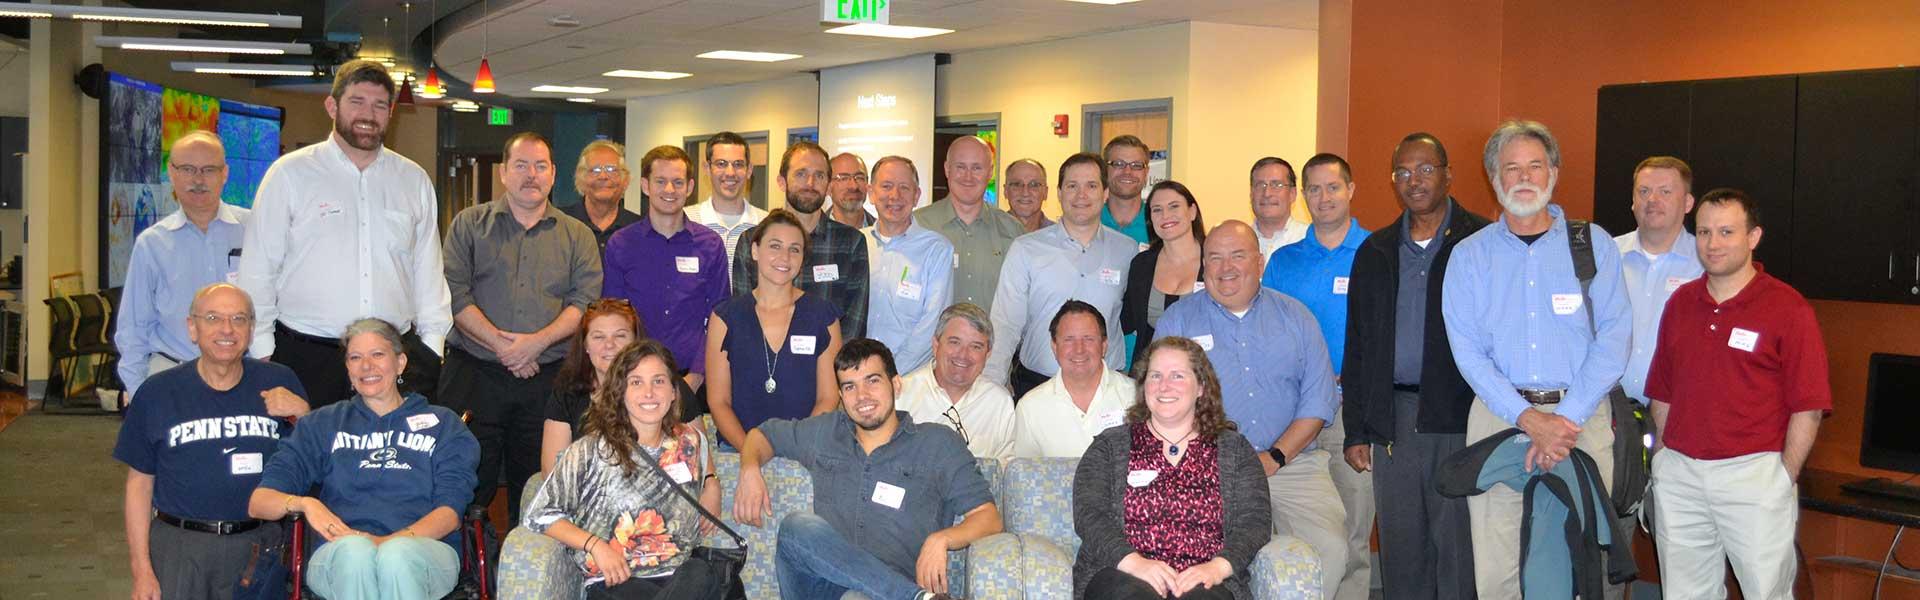 Weather Forecasting Alumni Reunion